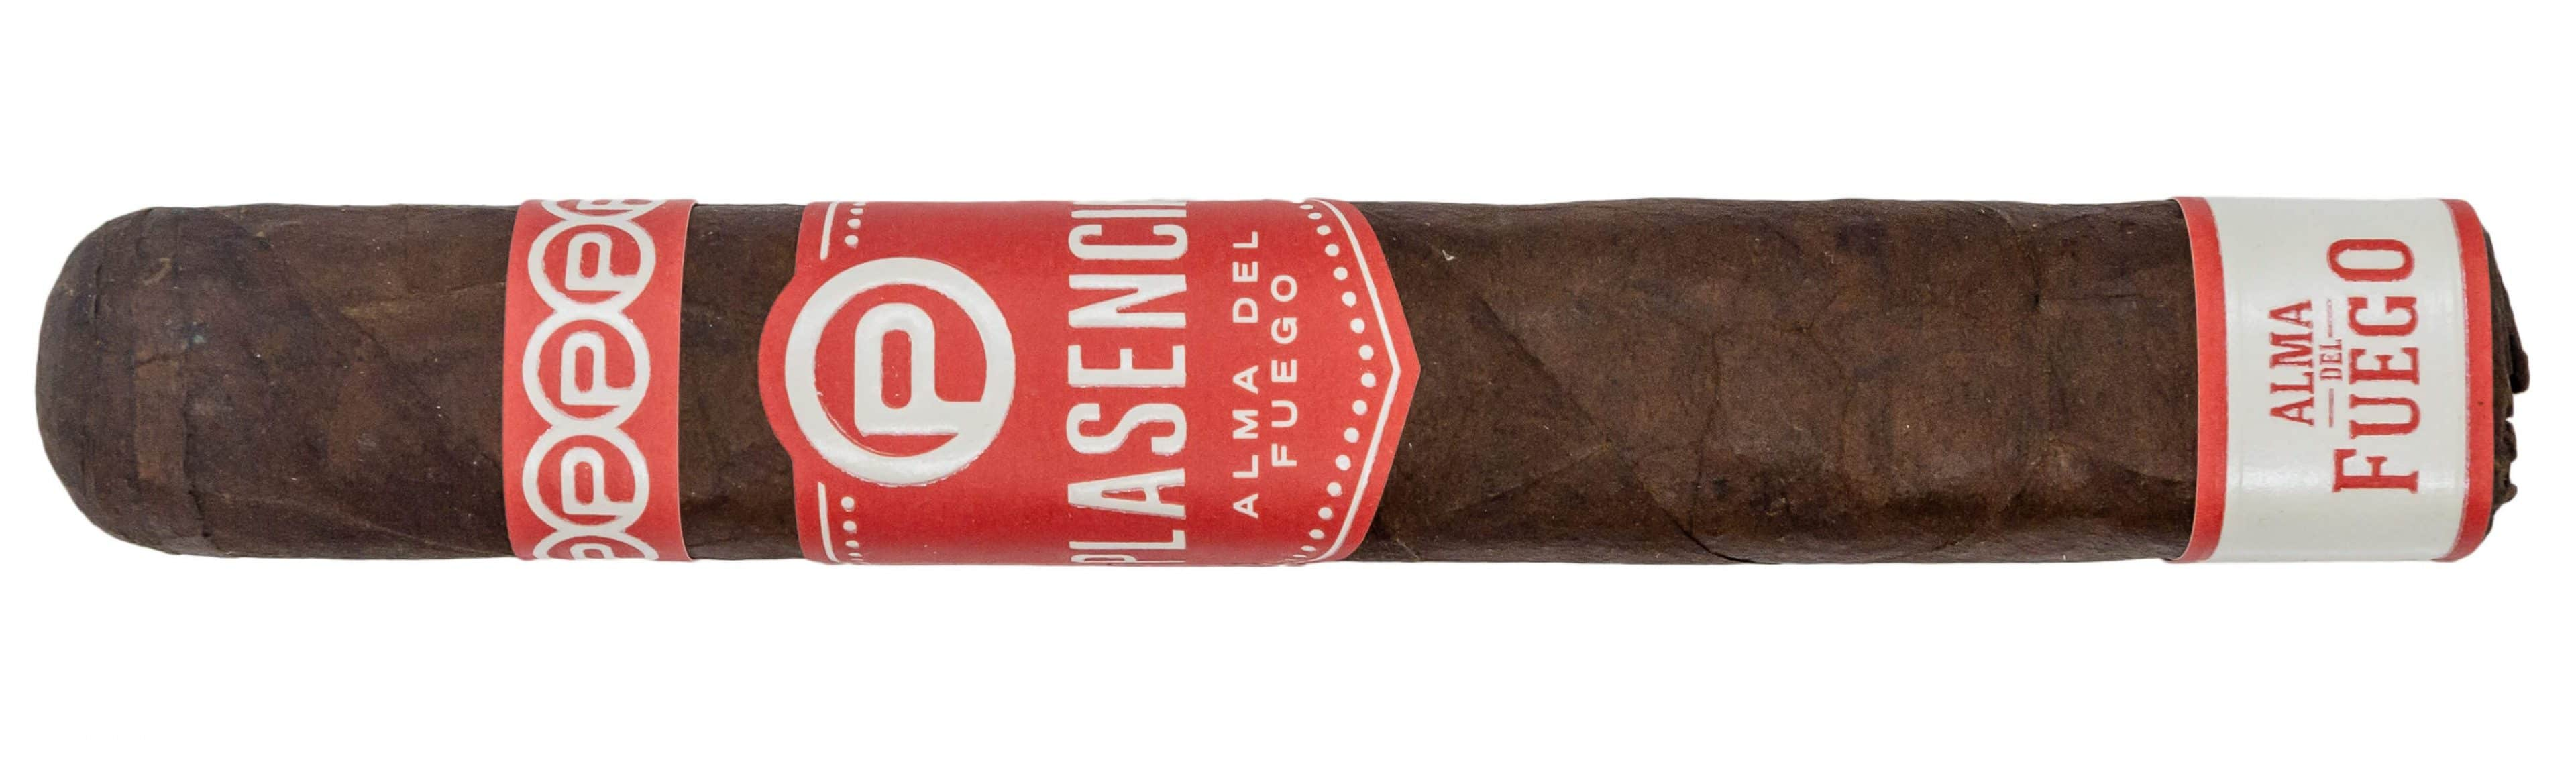 Blind Cigar Review: Plasencia | Alma del Fuego Candente